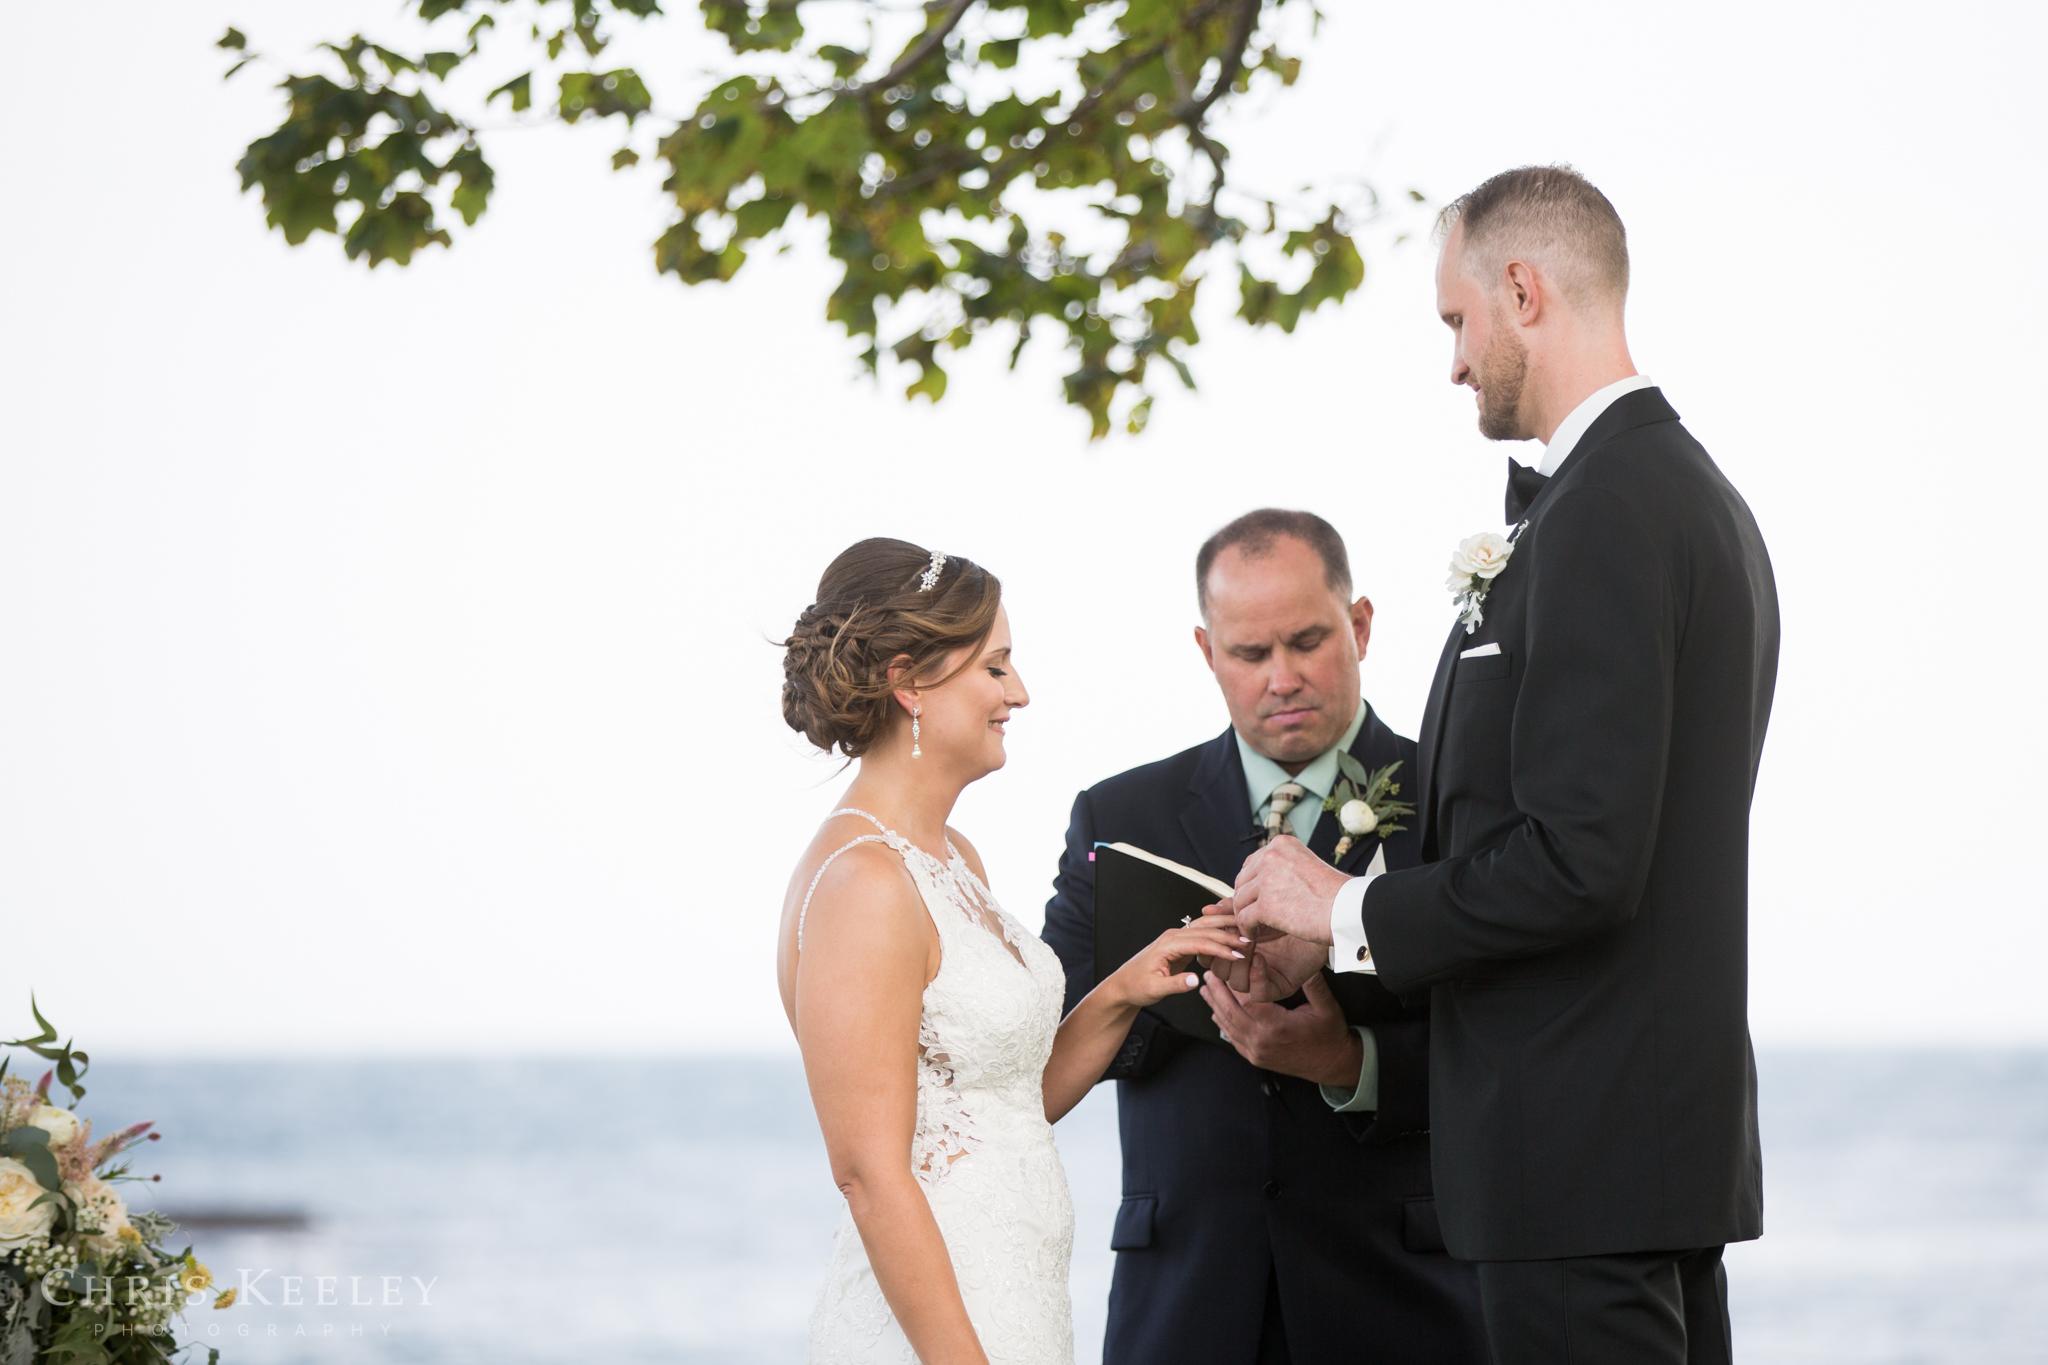 mombo-portsmouth-new-hampshire-wedding-photograper-40.jpg